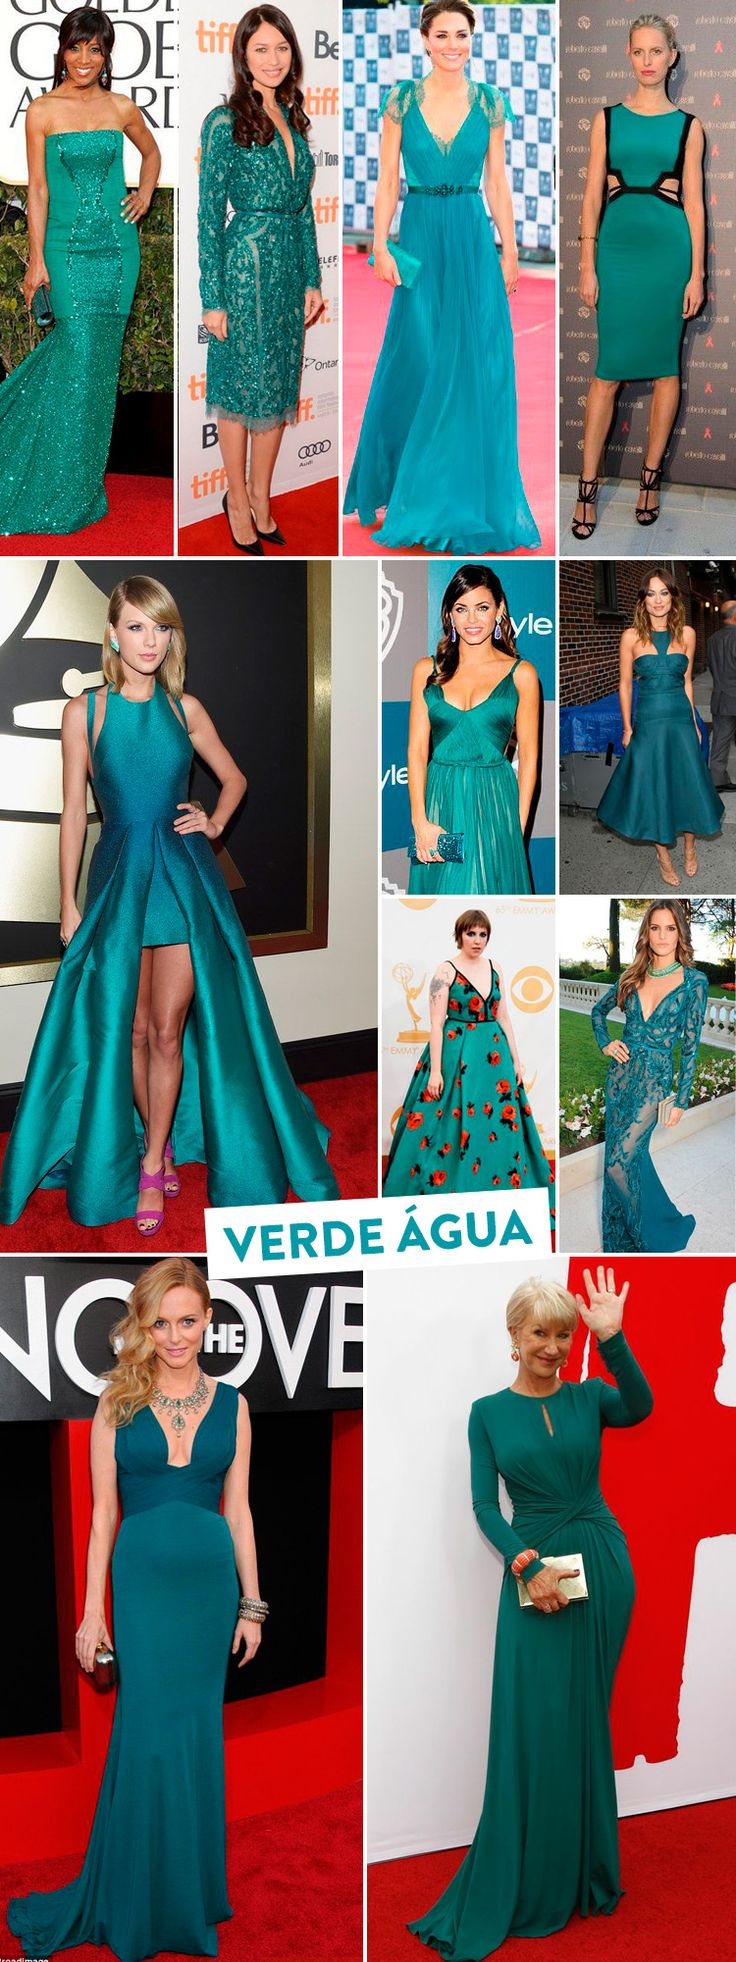 375 best Dresses images on Pinterest | Evening gowns, Ball dresses ...